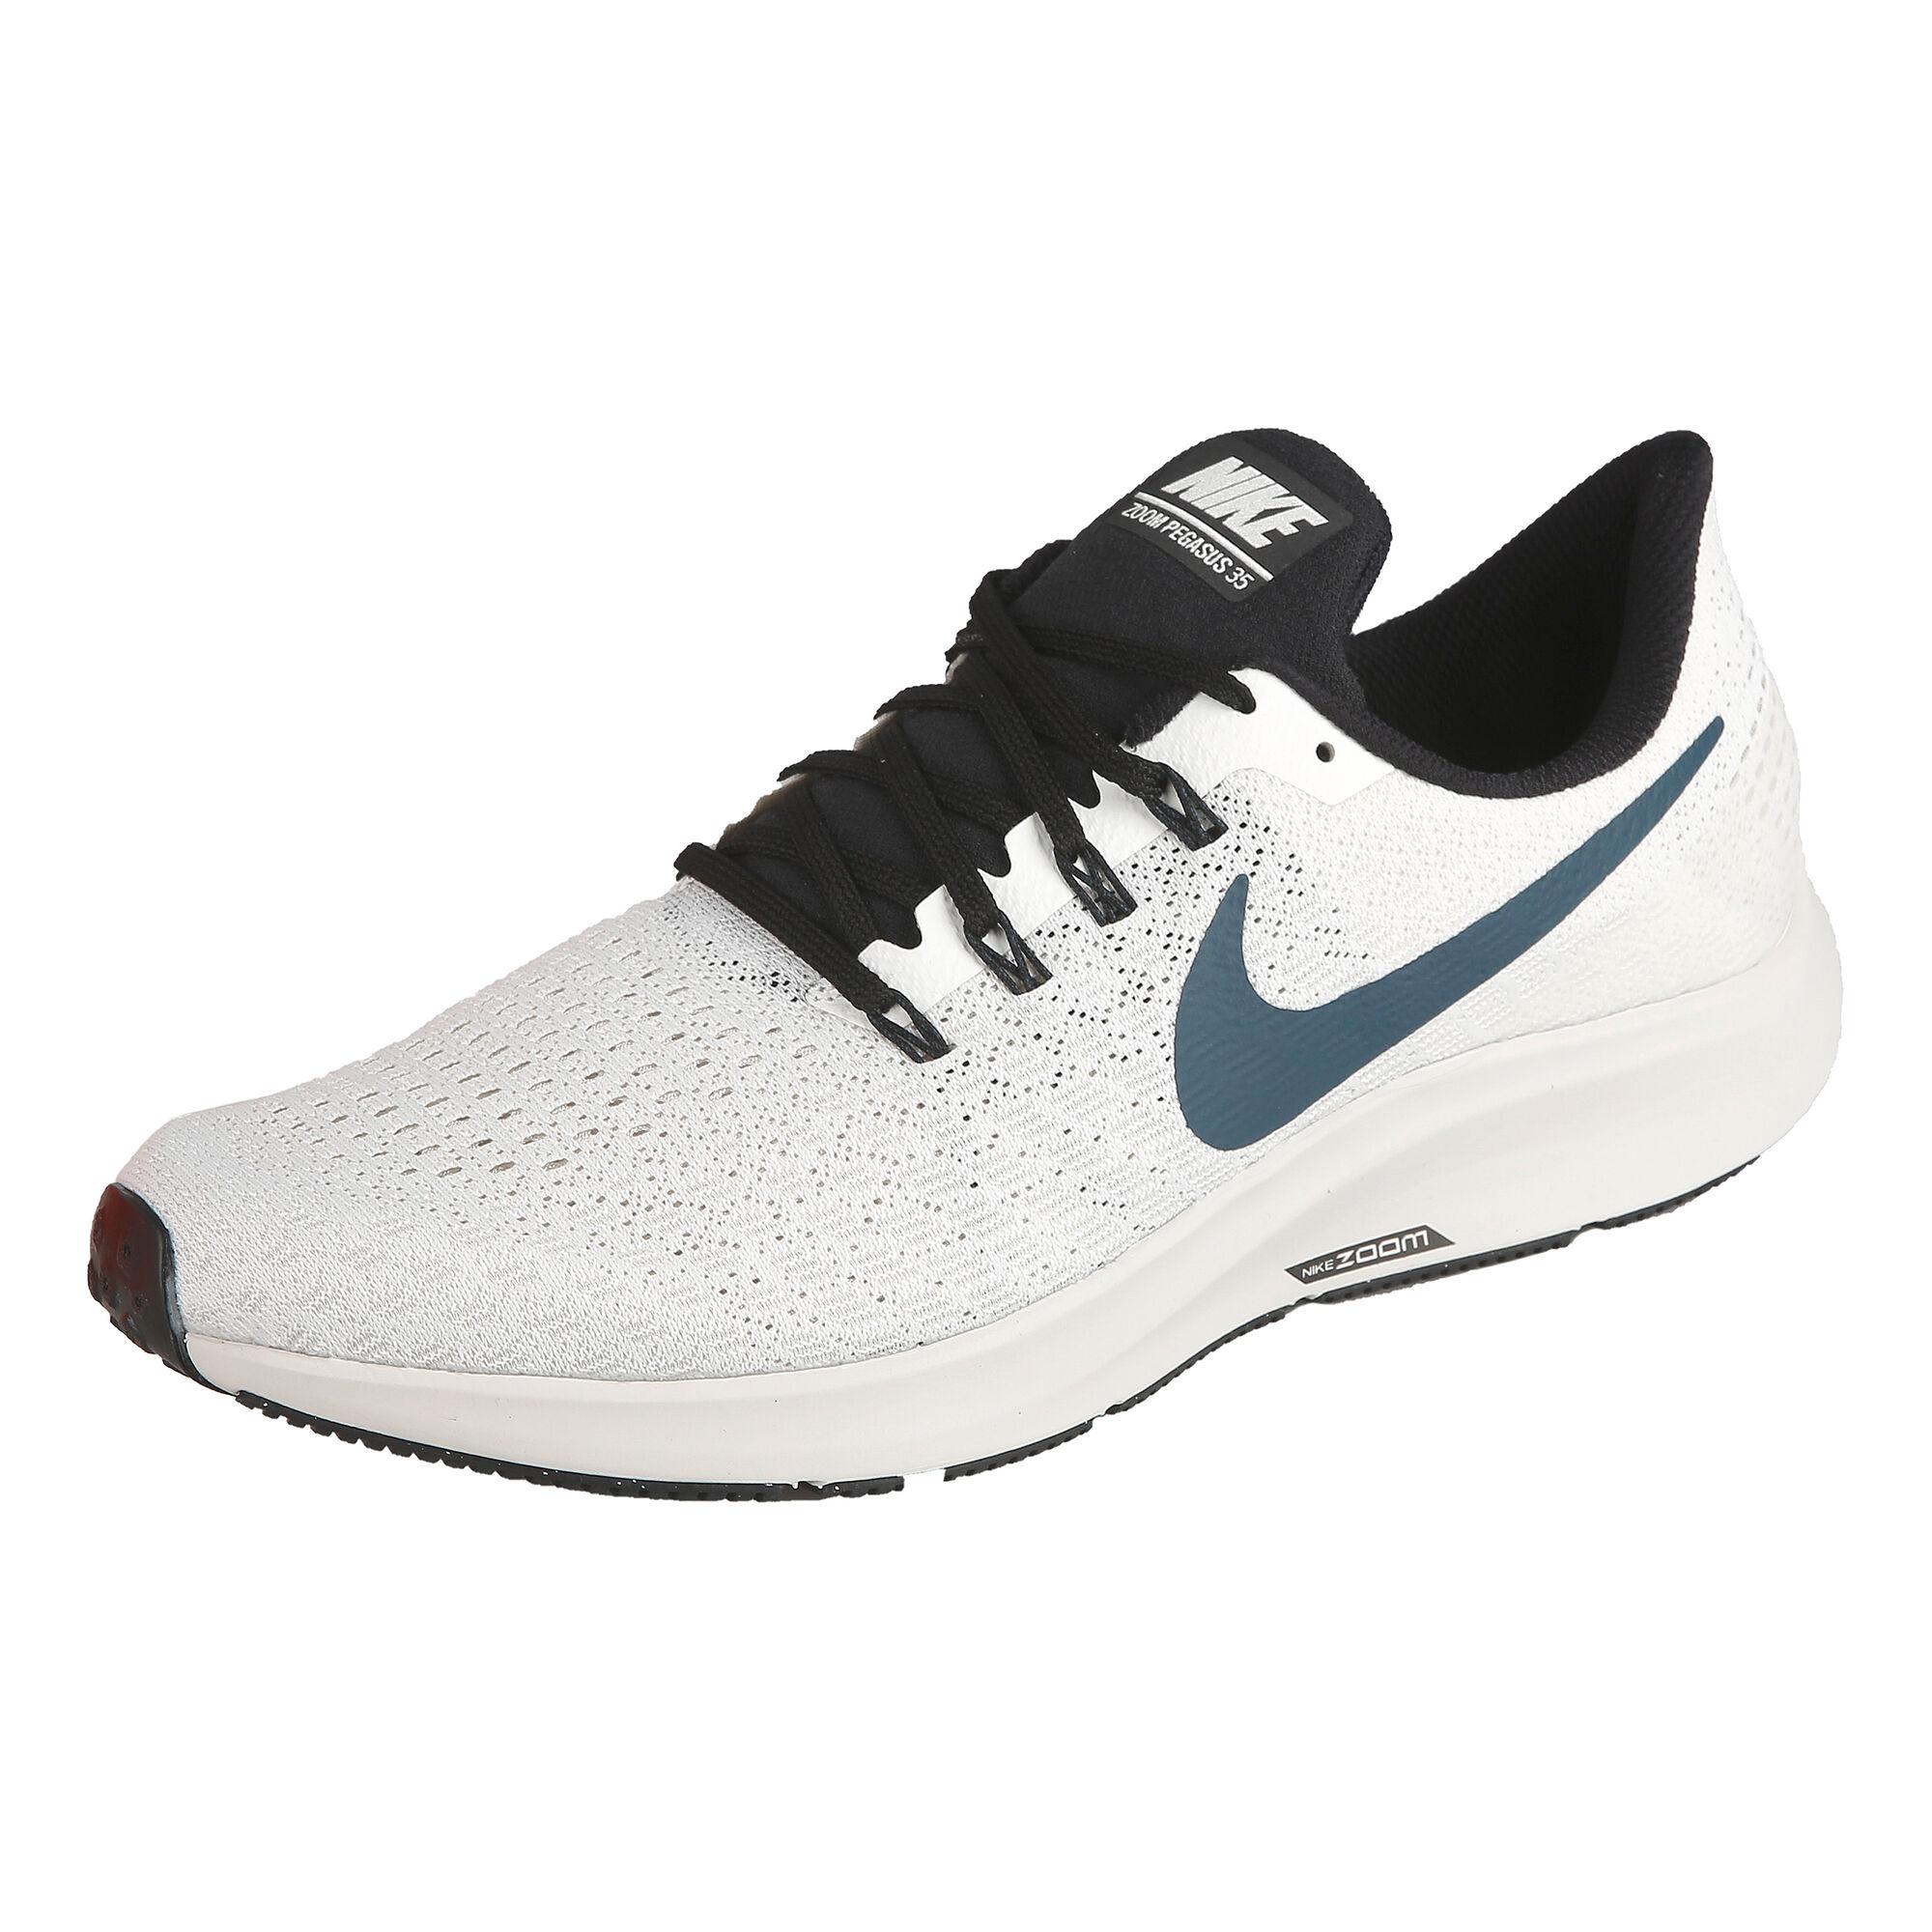 sports shoes 7729a 314f1 Nike Air Zoom Pegasus 35 Neutralschuh Herren - Creme, Dunkelblau ...